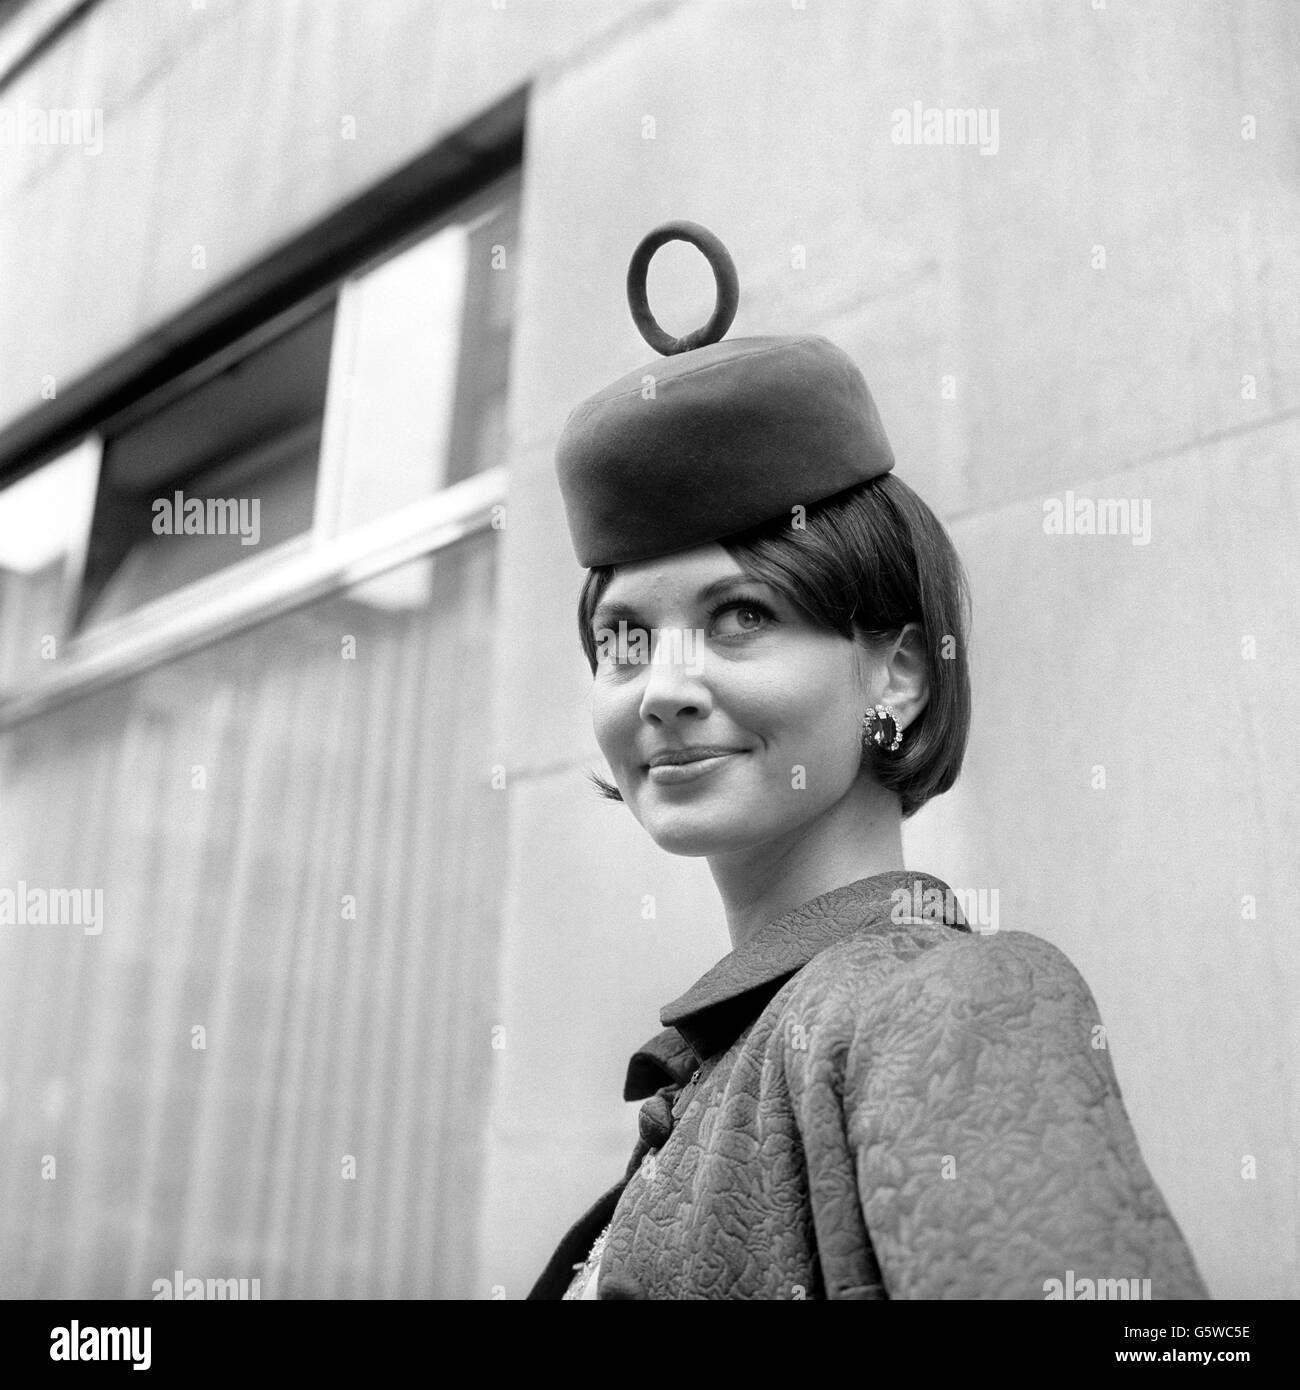 Antoinette Taus (b. 1981) picture